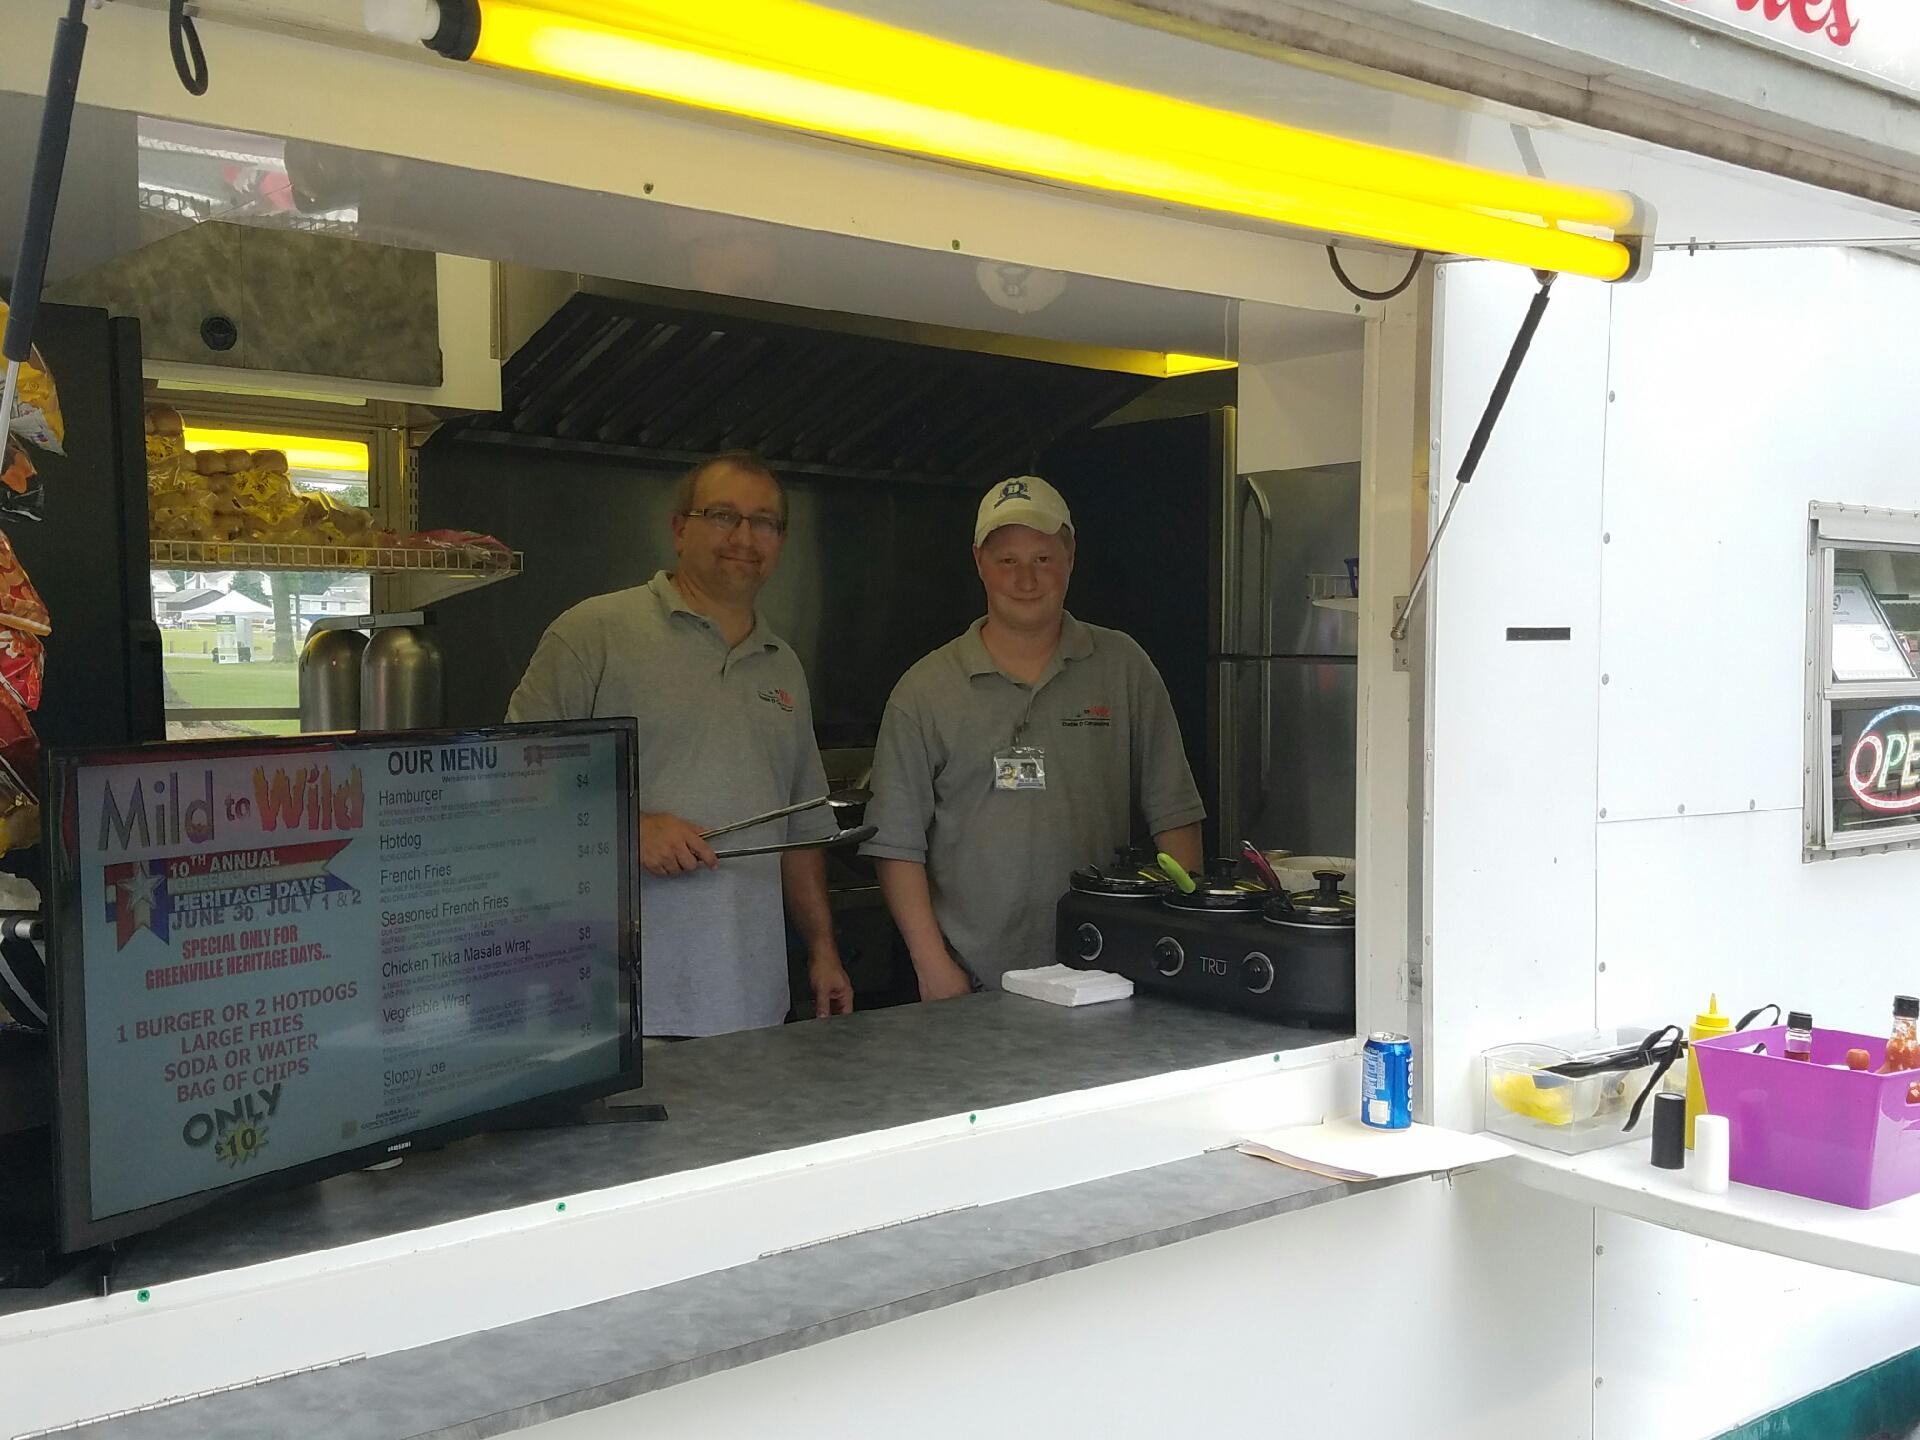 Owners: Derrick & Tim